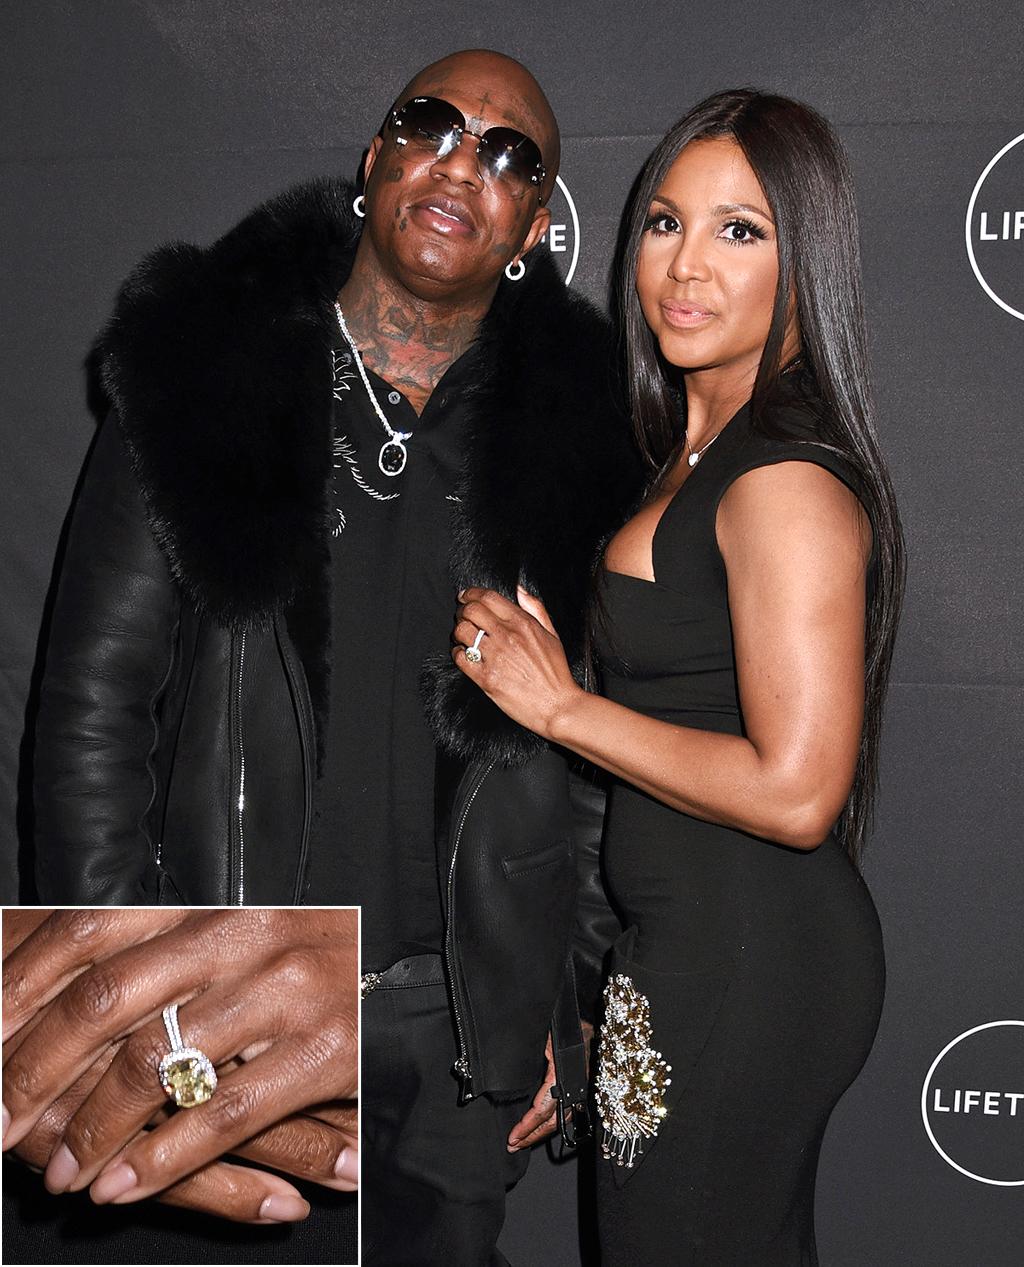 Toni Braxton's Engagement Ring From Birdman Is Mia Singer Hopeful It Will Be Returned: Cyn Santana Wedding Ring At Websimilar.org